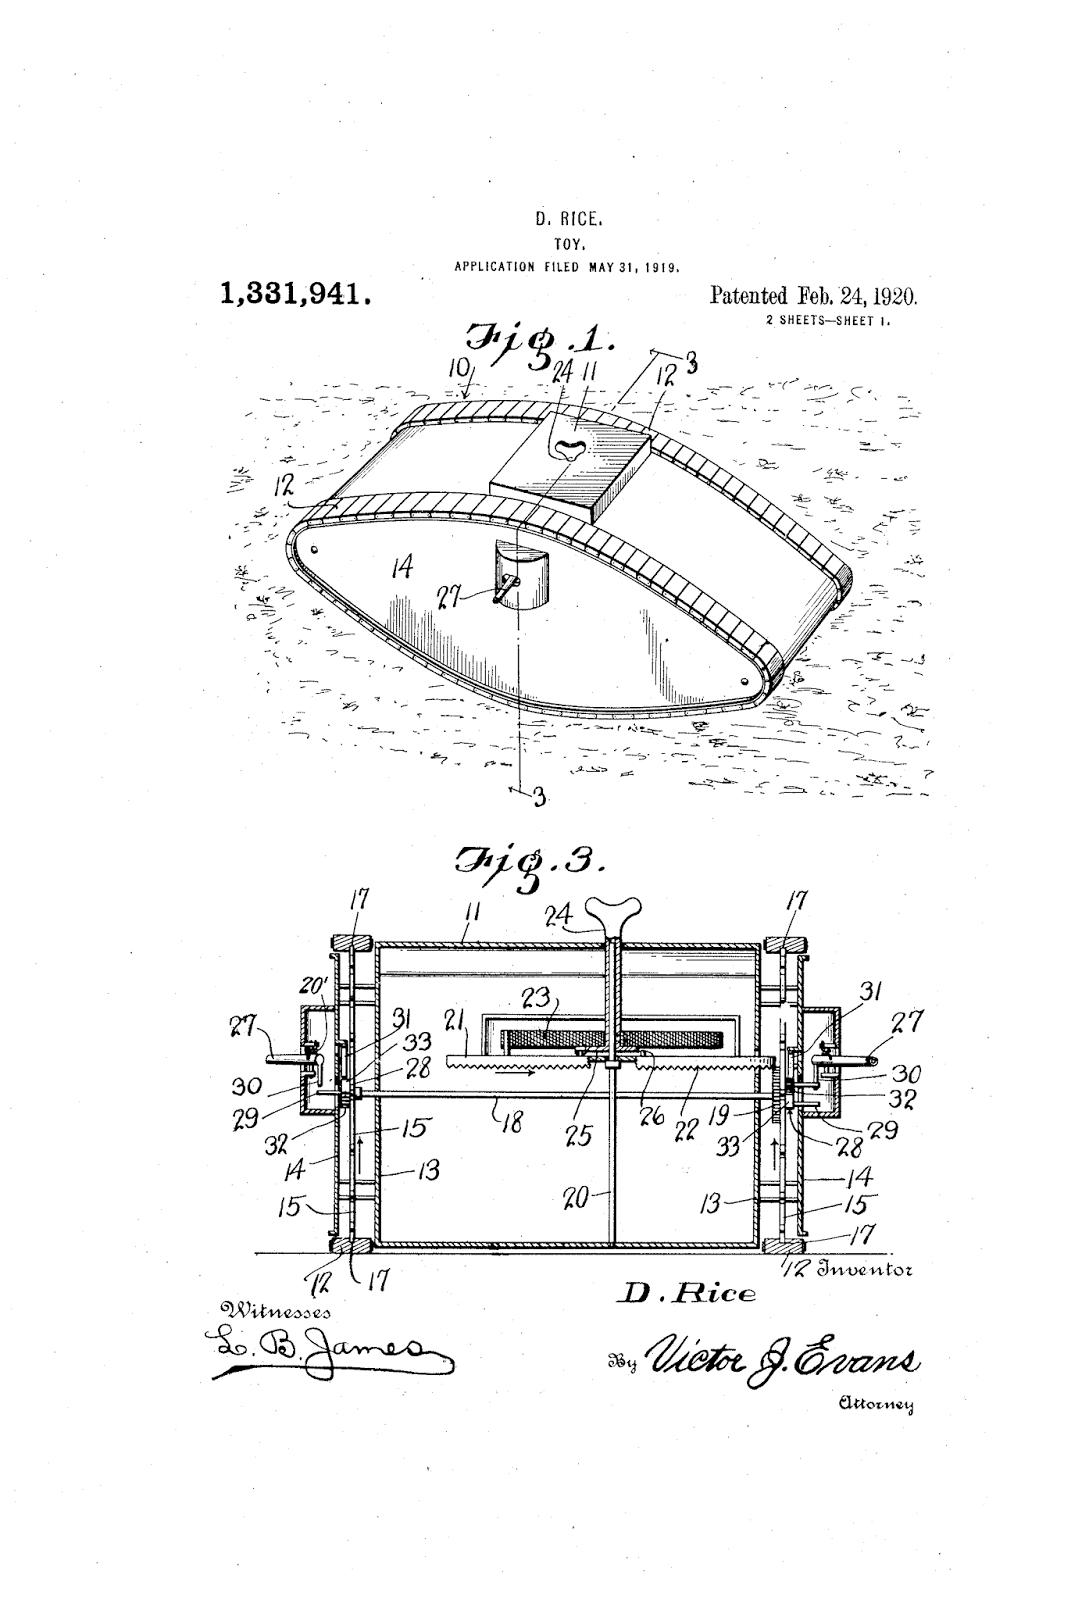 World Patent Information | ScienceDirect.com